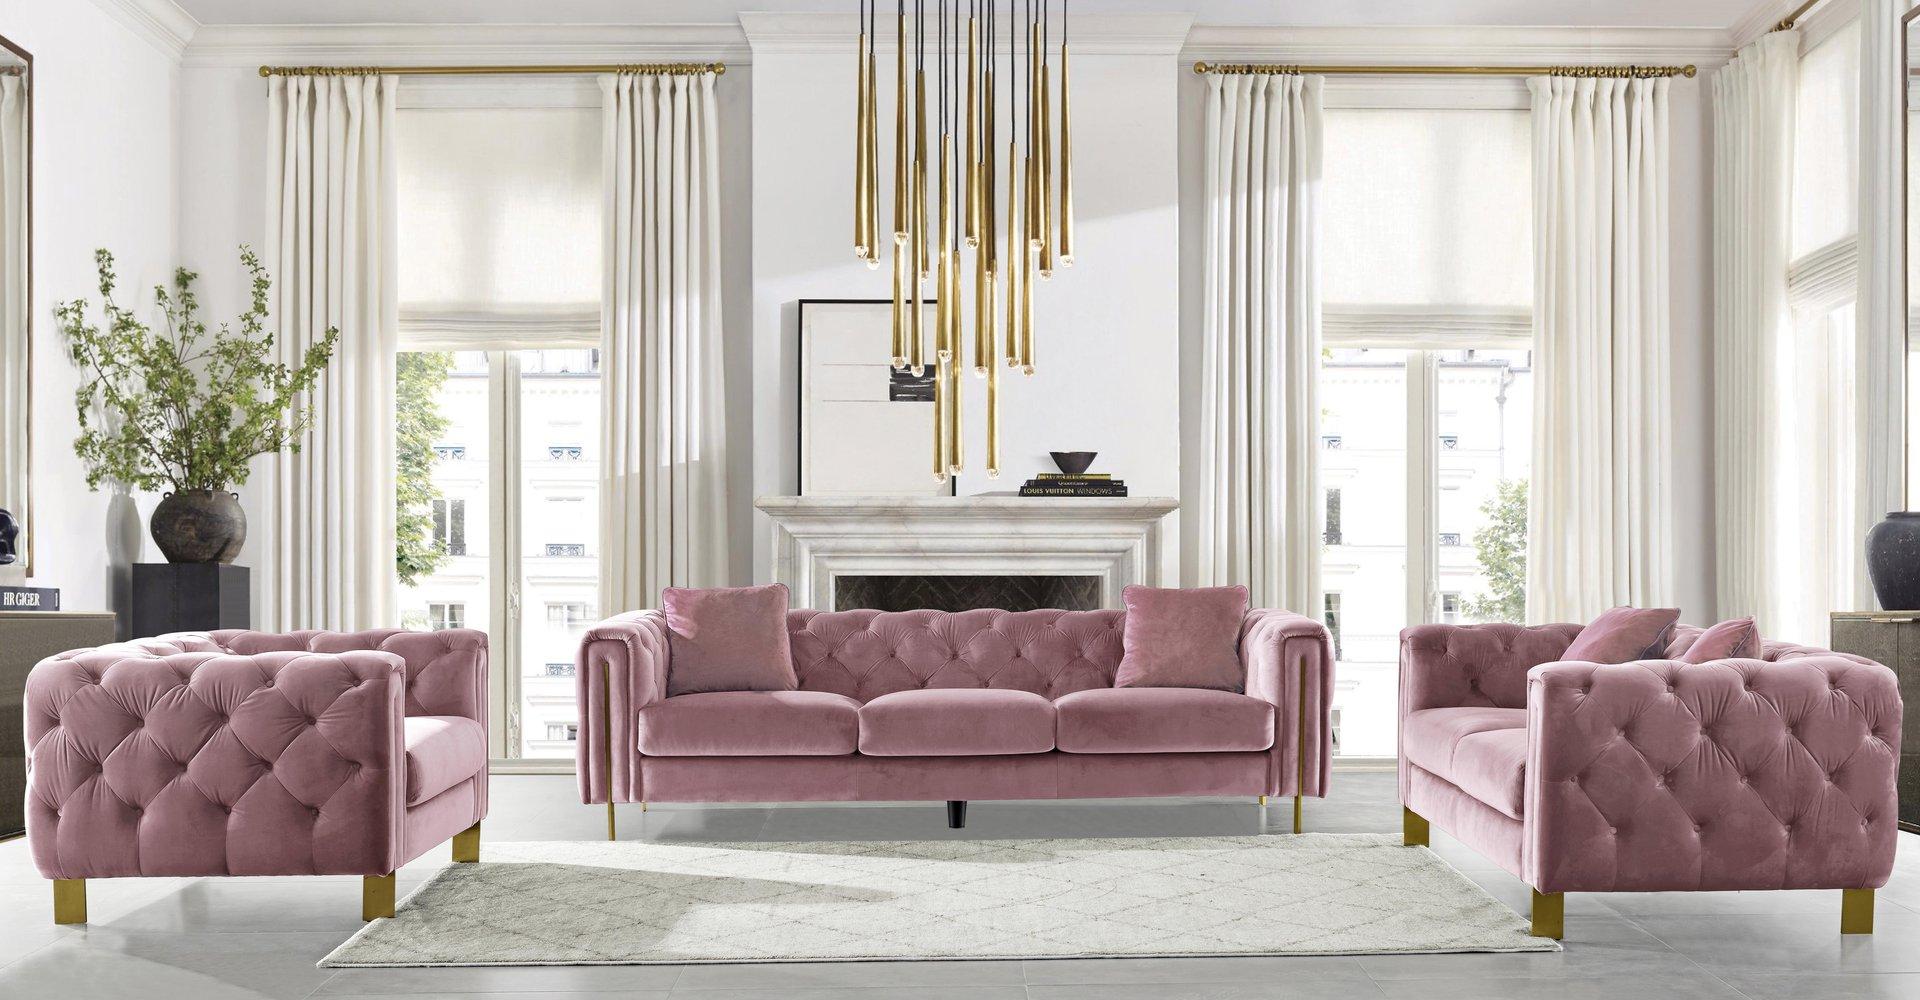 United Furniture  The Galleria Al Maryah Island, Abu Dhabi